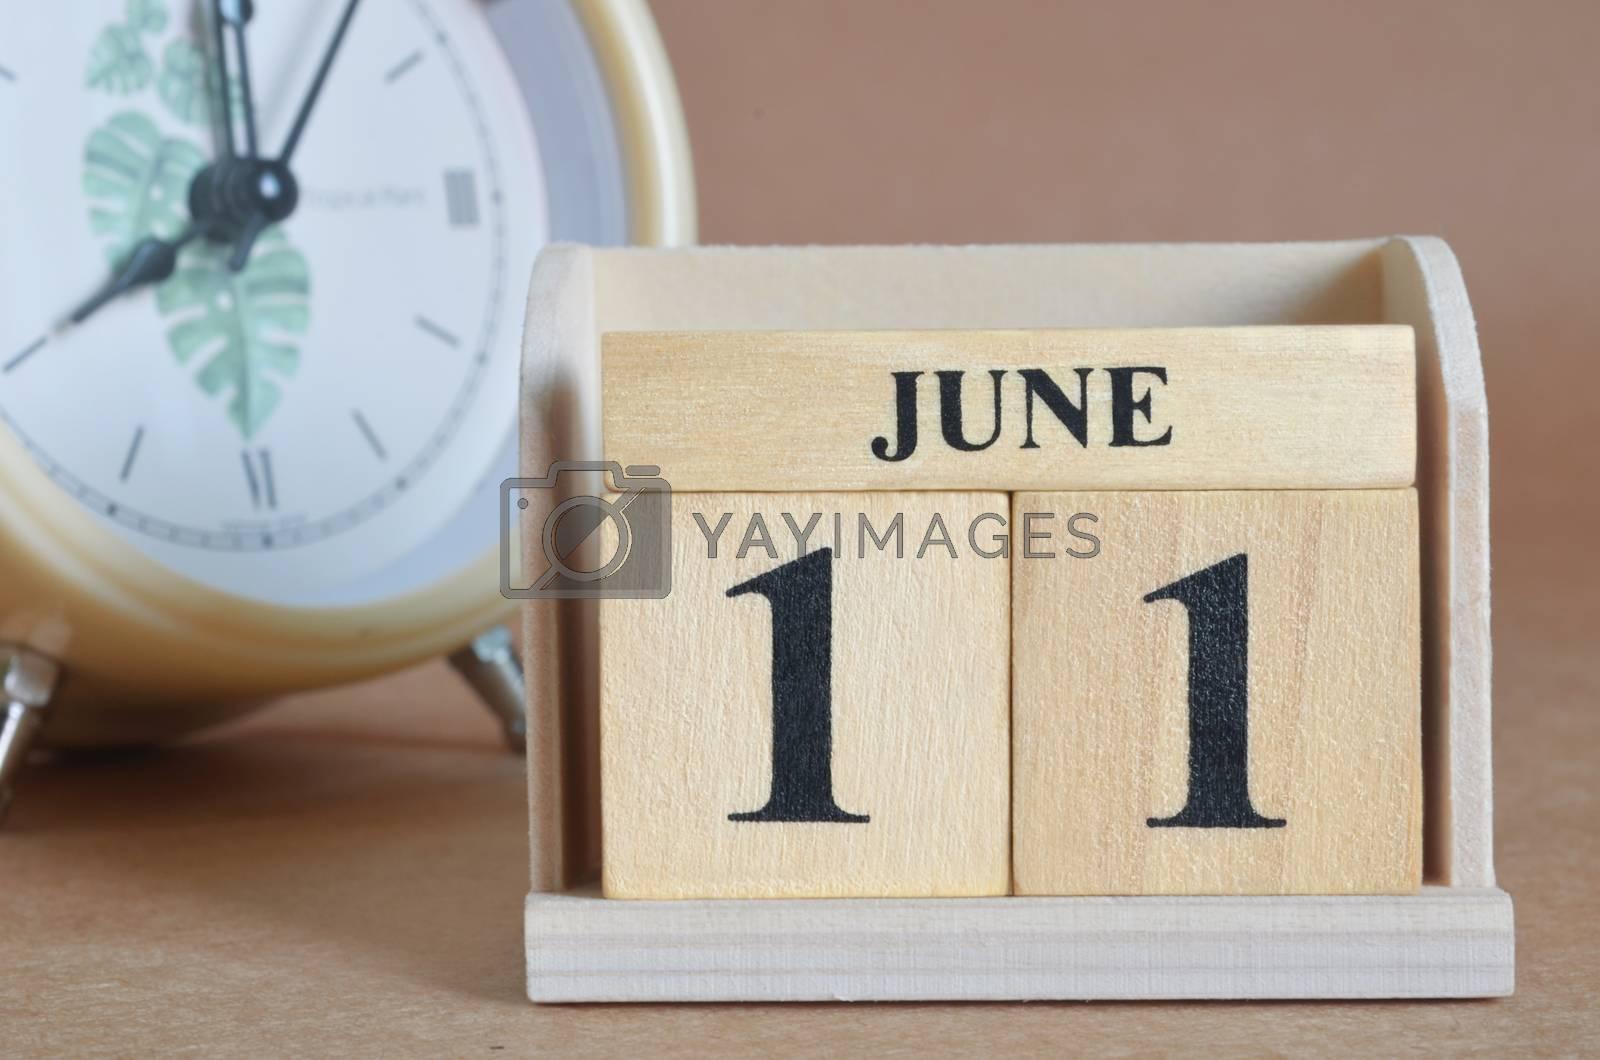 June 11 by Mrfrost